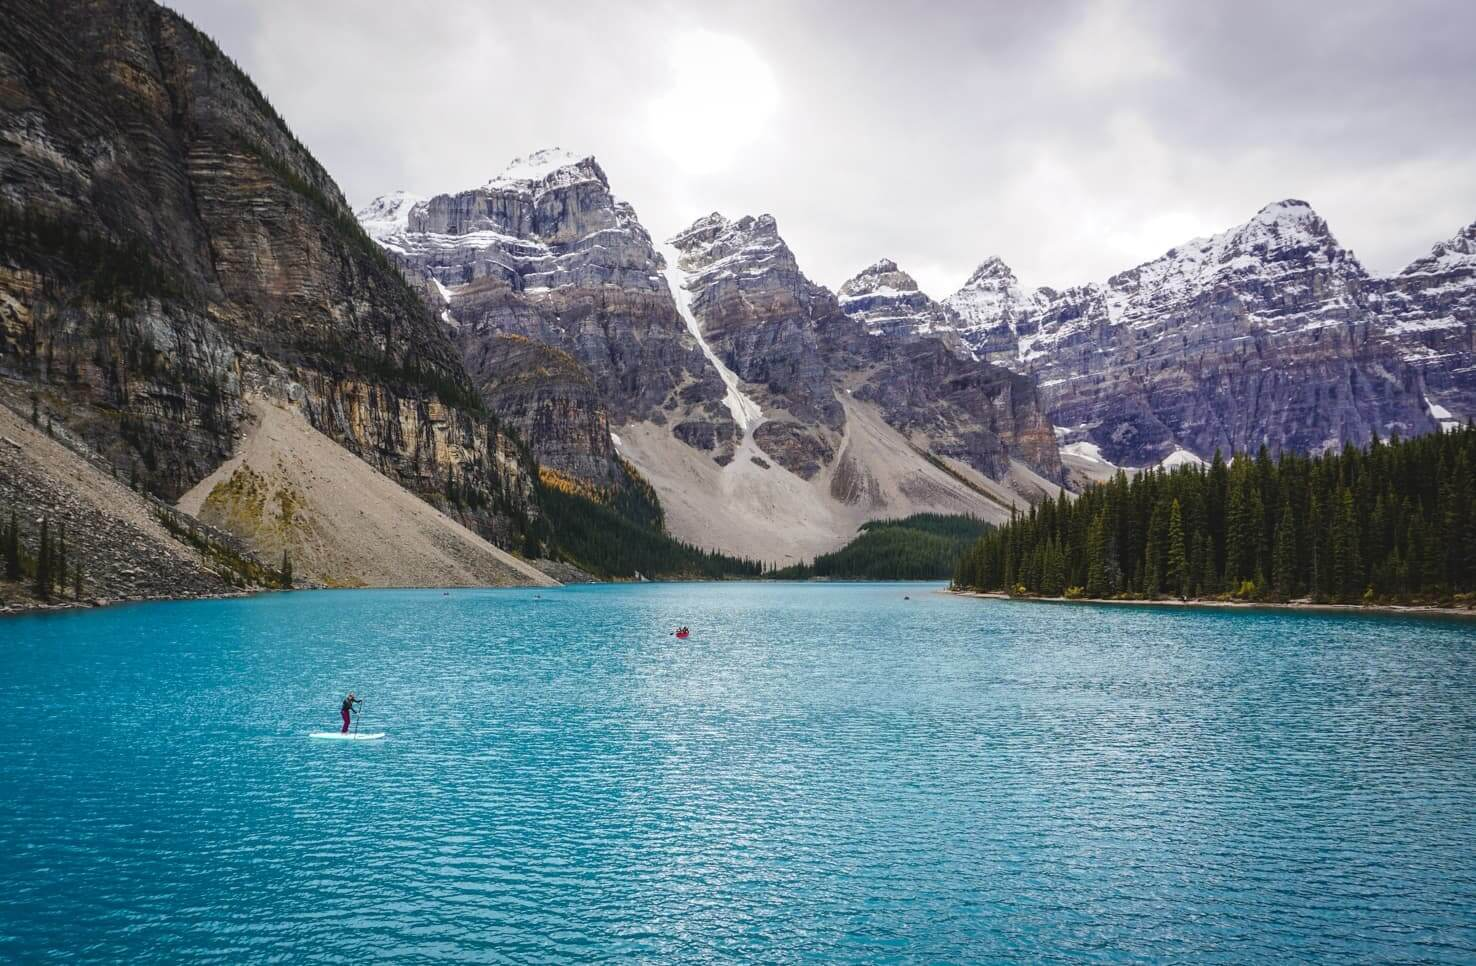 Canadian Rockies road trip itinerary - Moraine Lake, Banff National Park